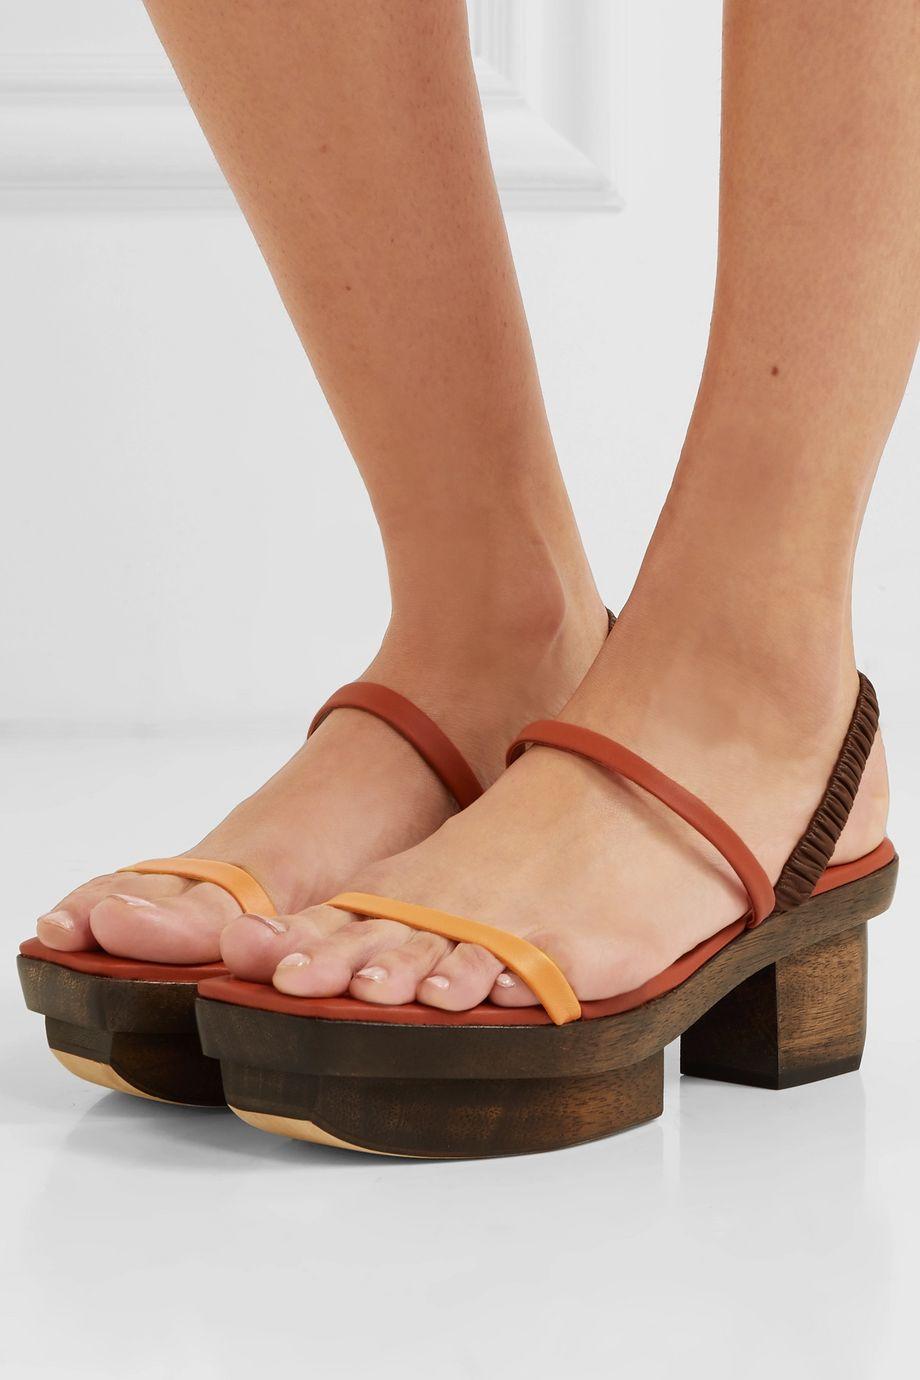 Cult Gaia Fifi leather platform sandals